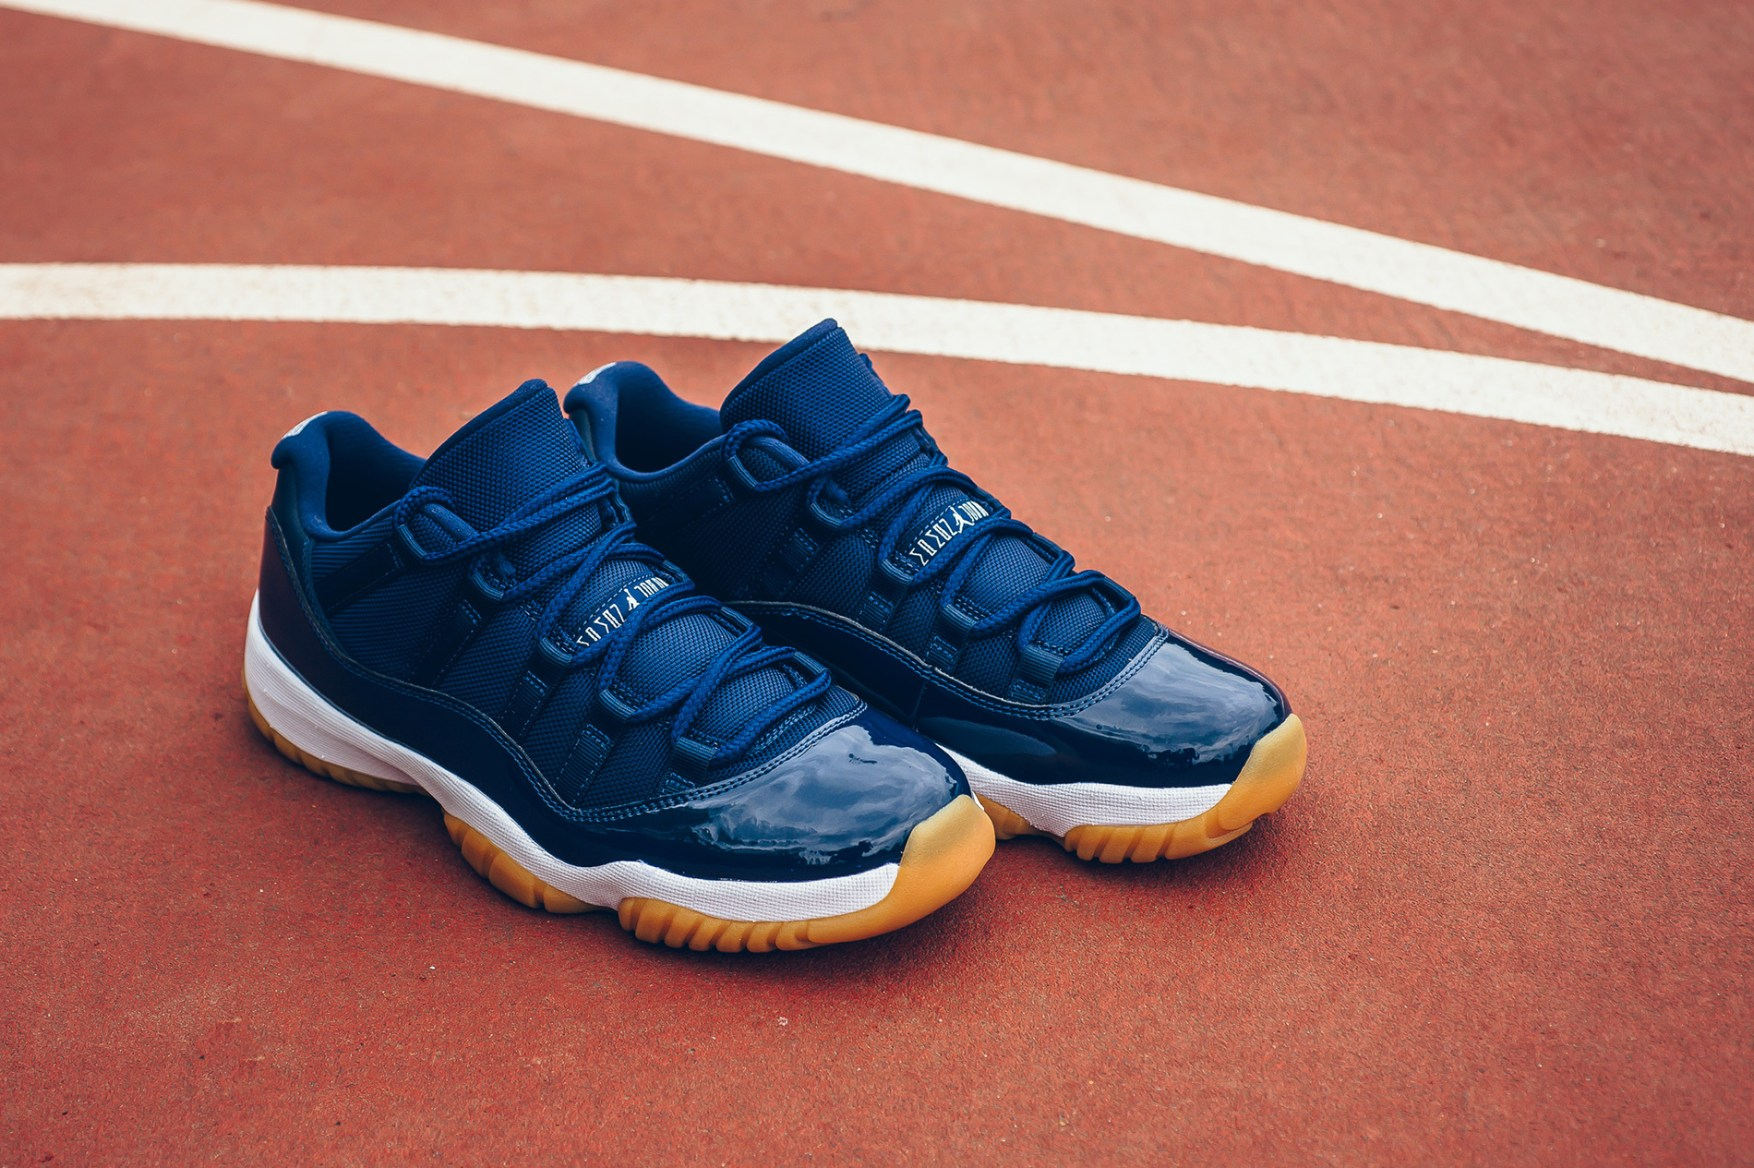 List Of Legit Jordan Shoes